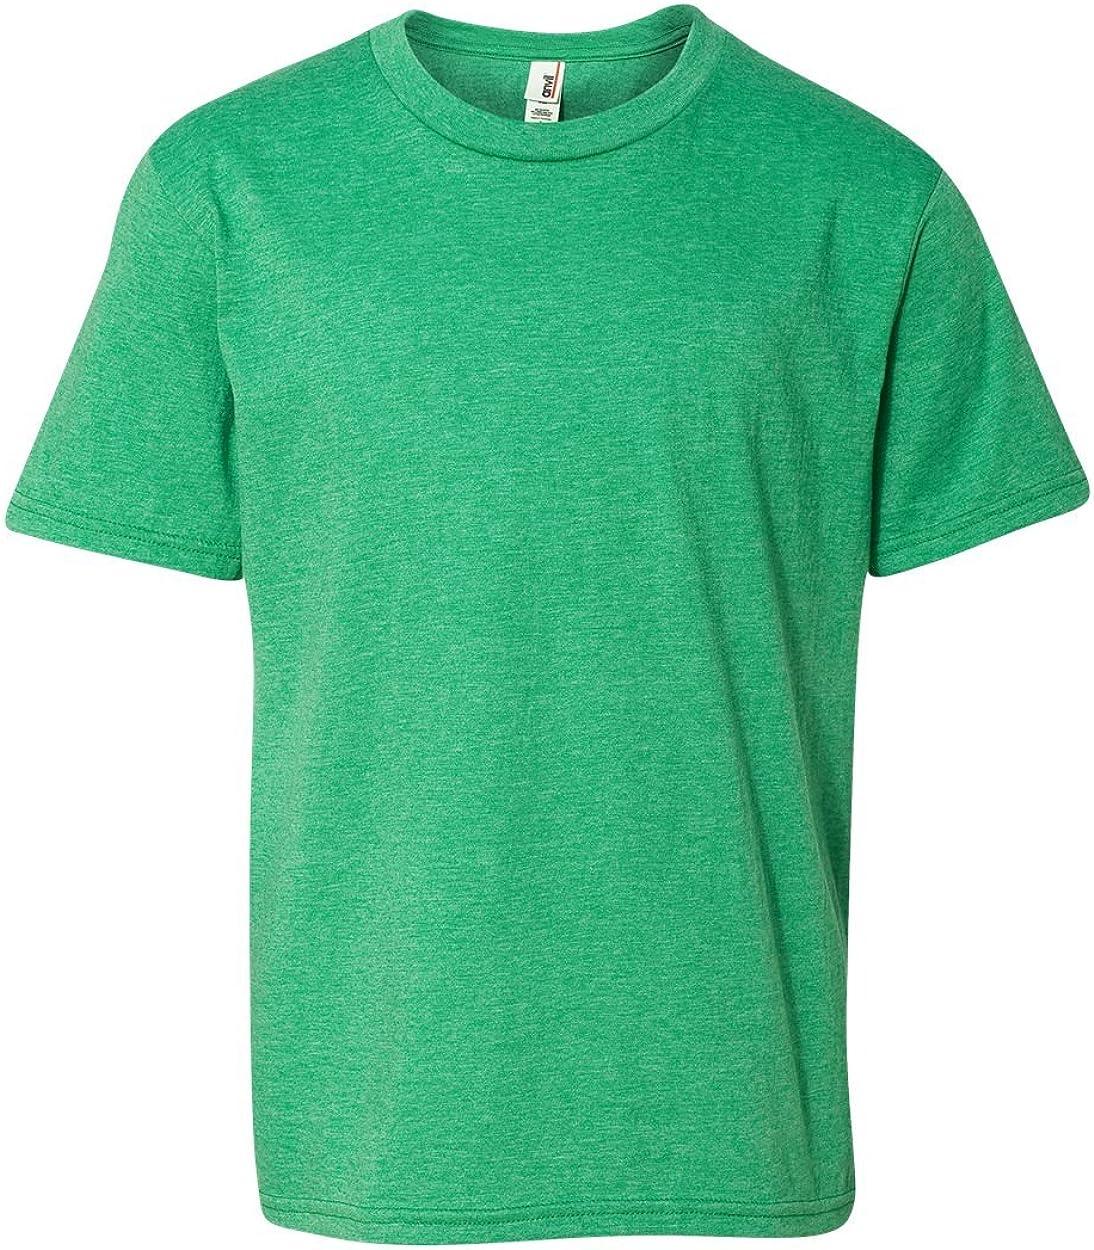 Anvil Youth Lightweight T-Shirt (990B) HEATHER GREEN